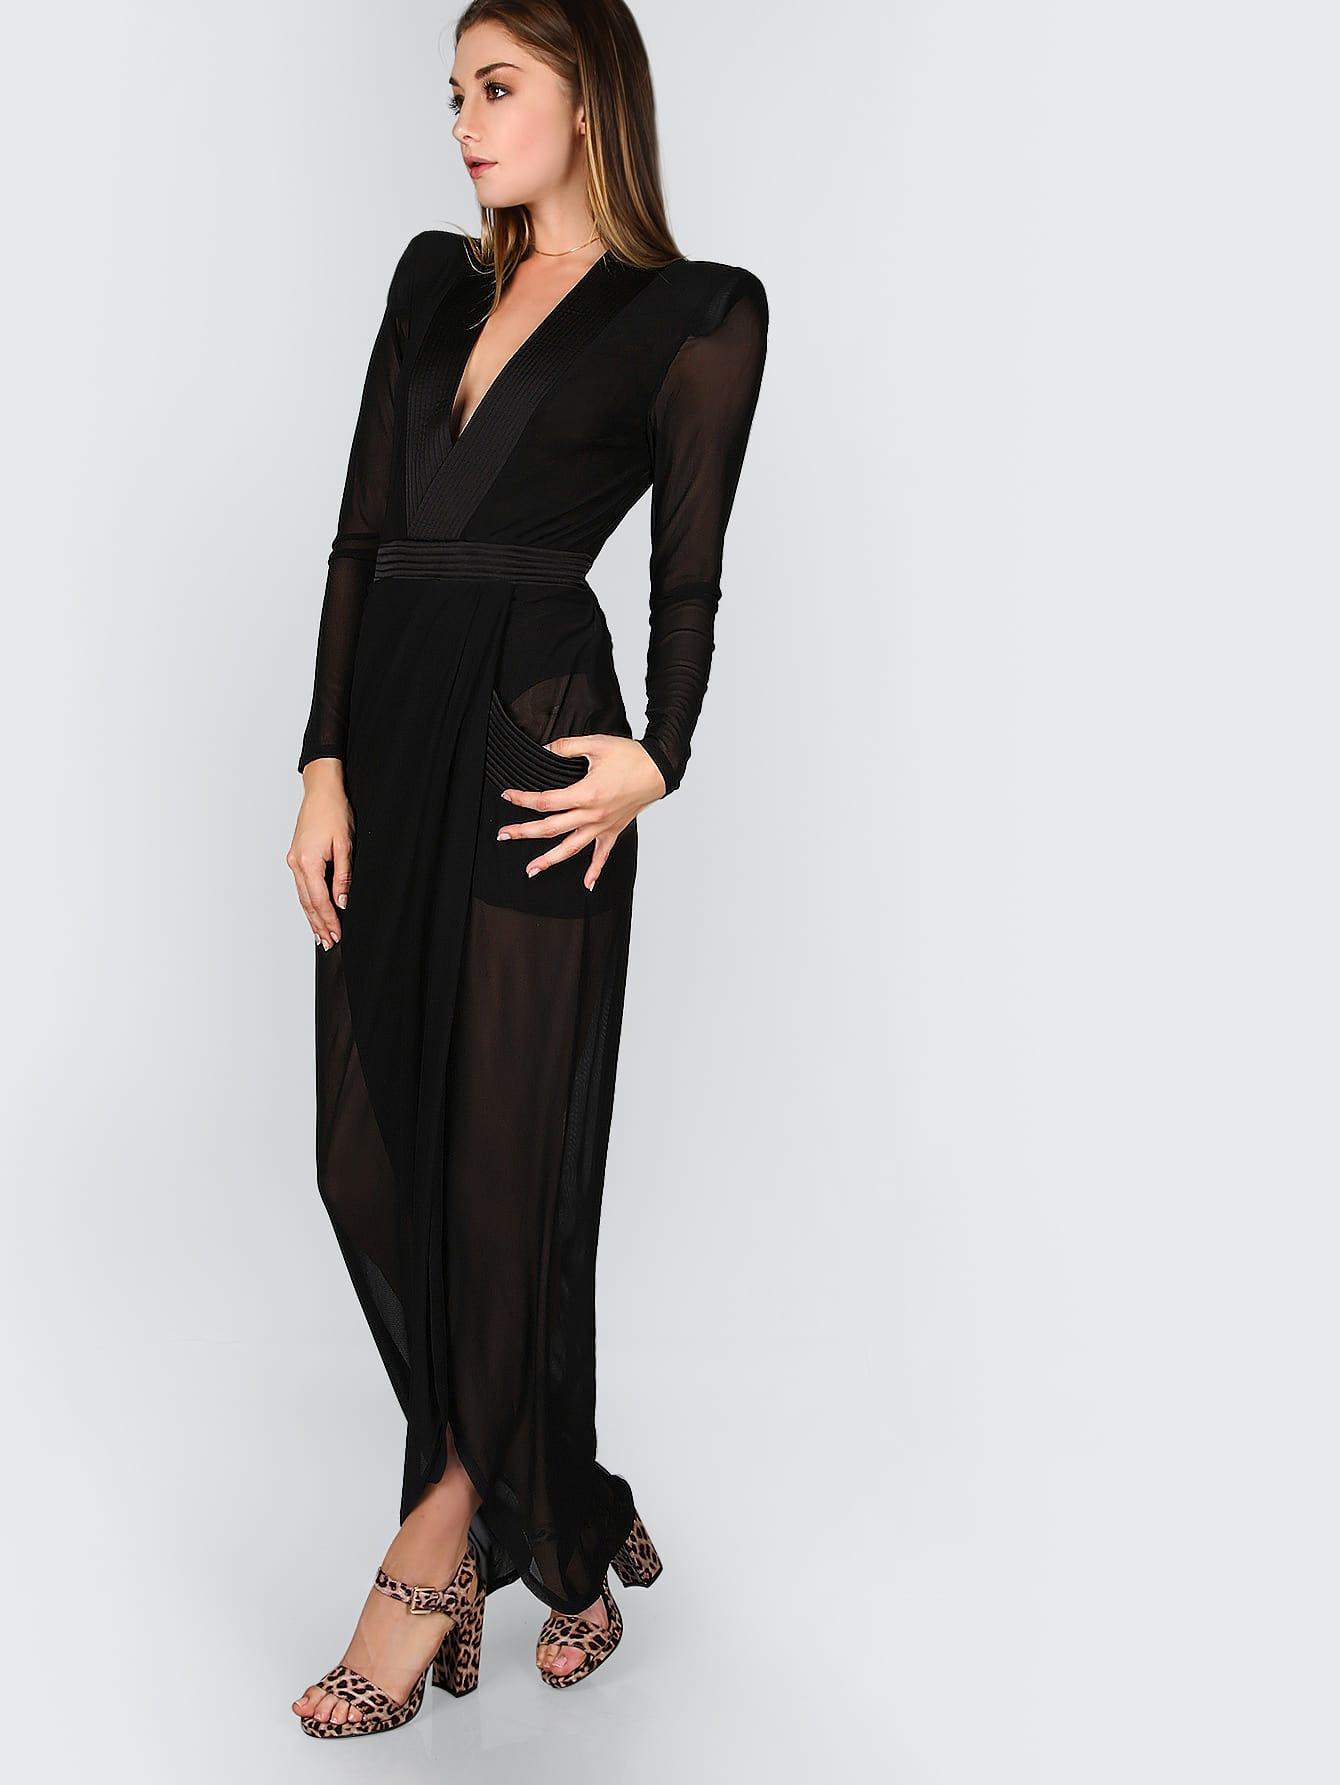 Green Striped Contrast Deep V Neck Wrap Dress EmmaCloth-Women Fast ... 89da7e1d2